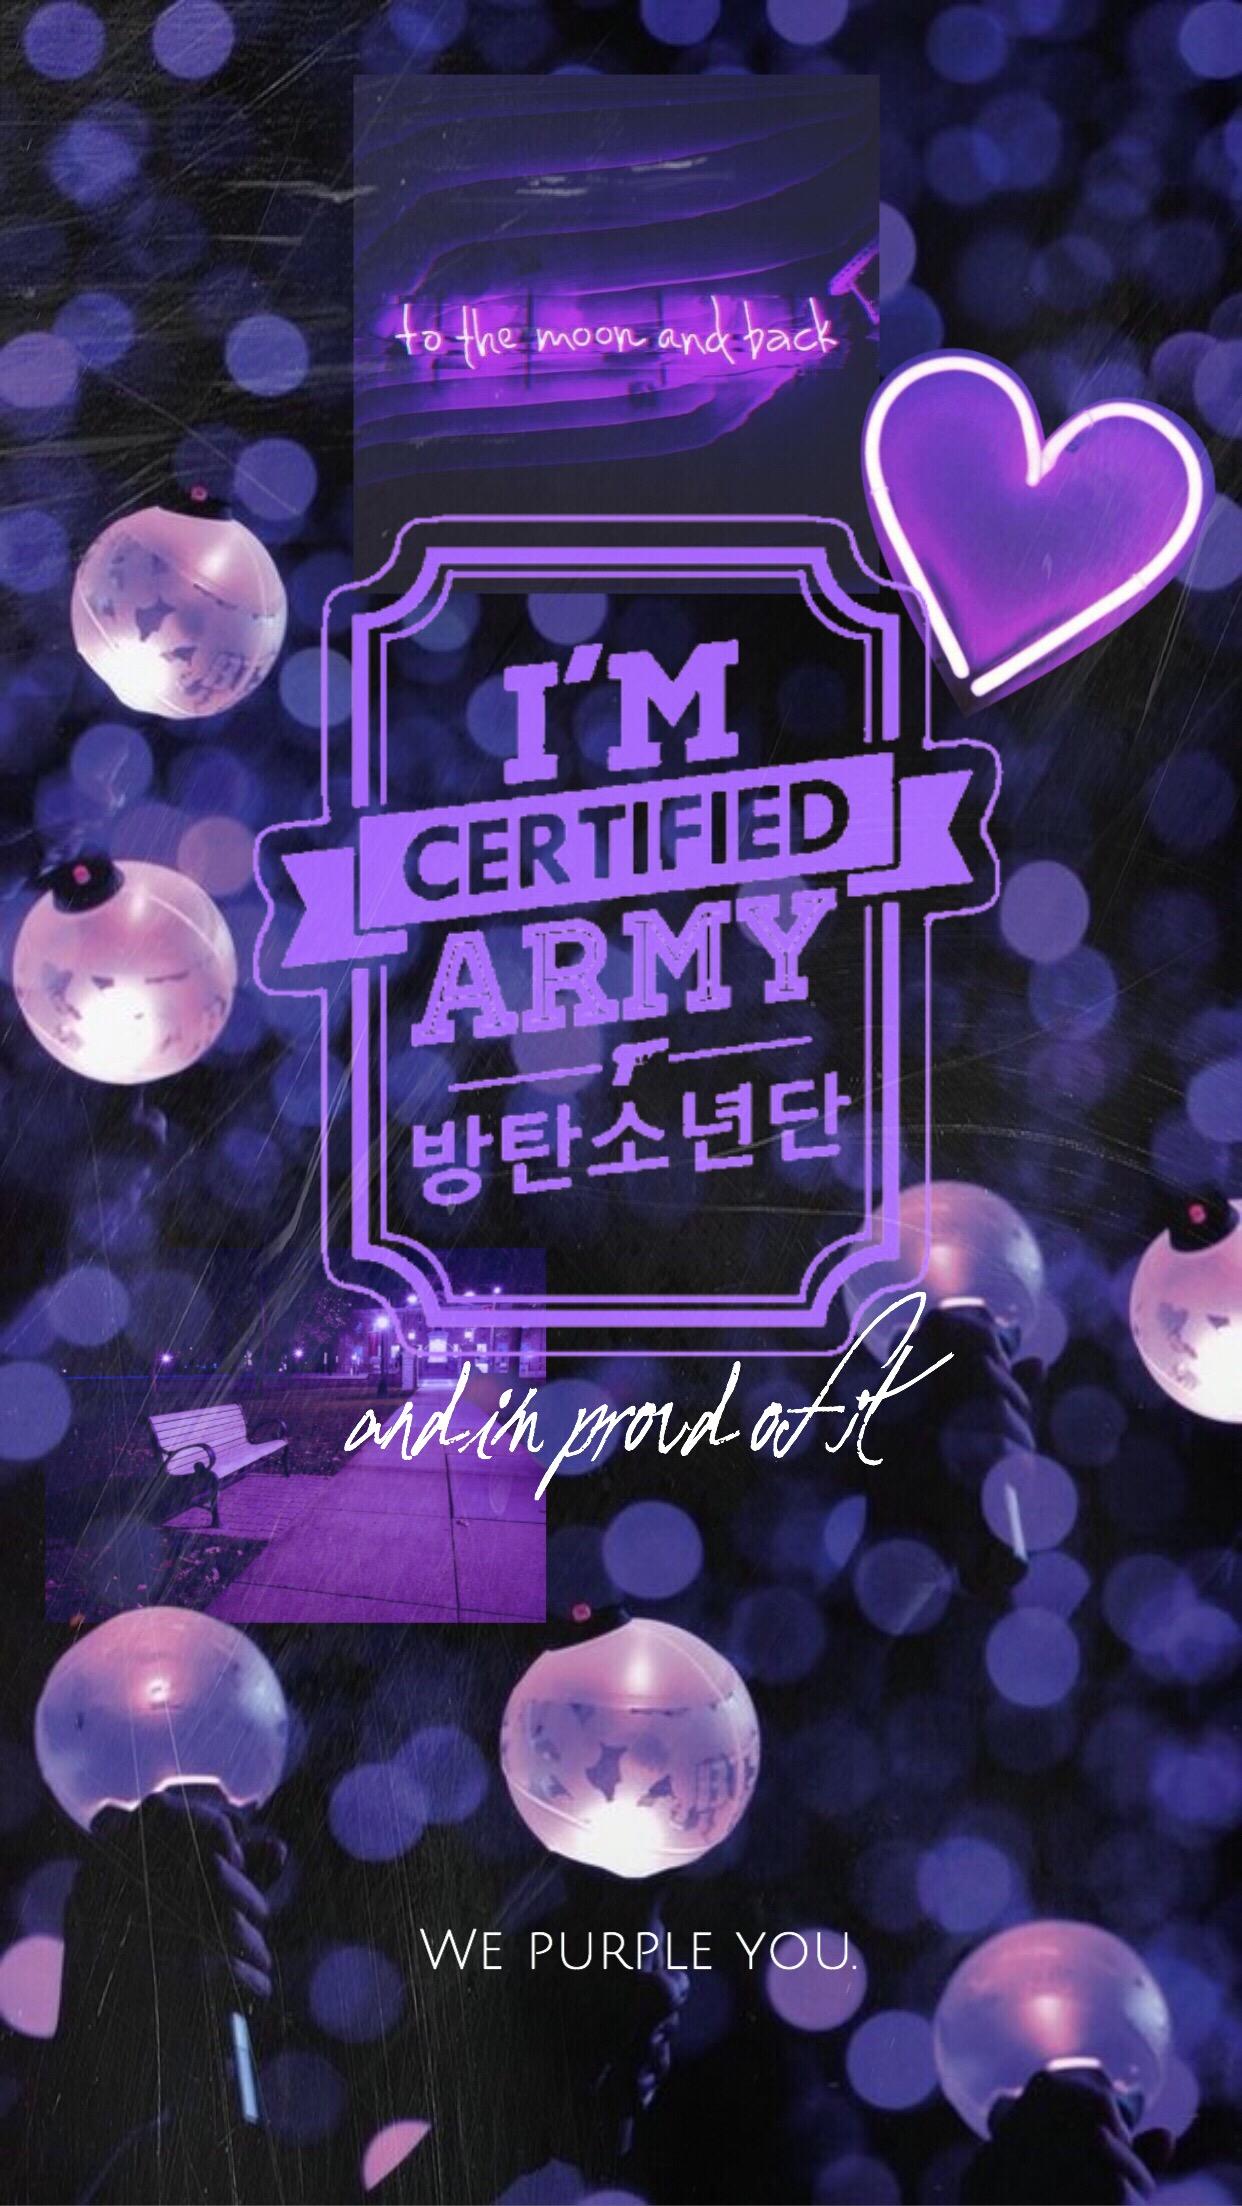 Armybts Army Ipurpleyou Wallpaperedit Wallpaper Bts Pur